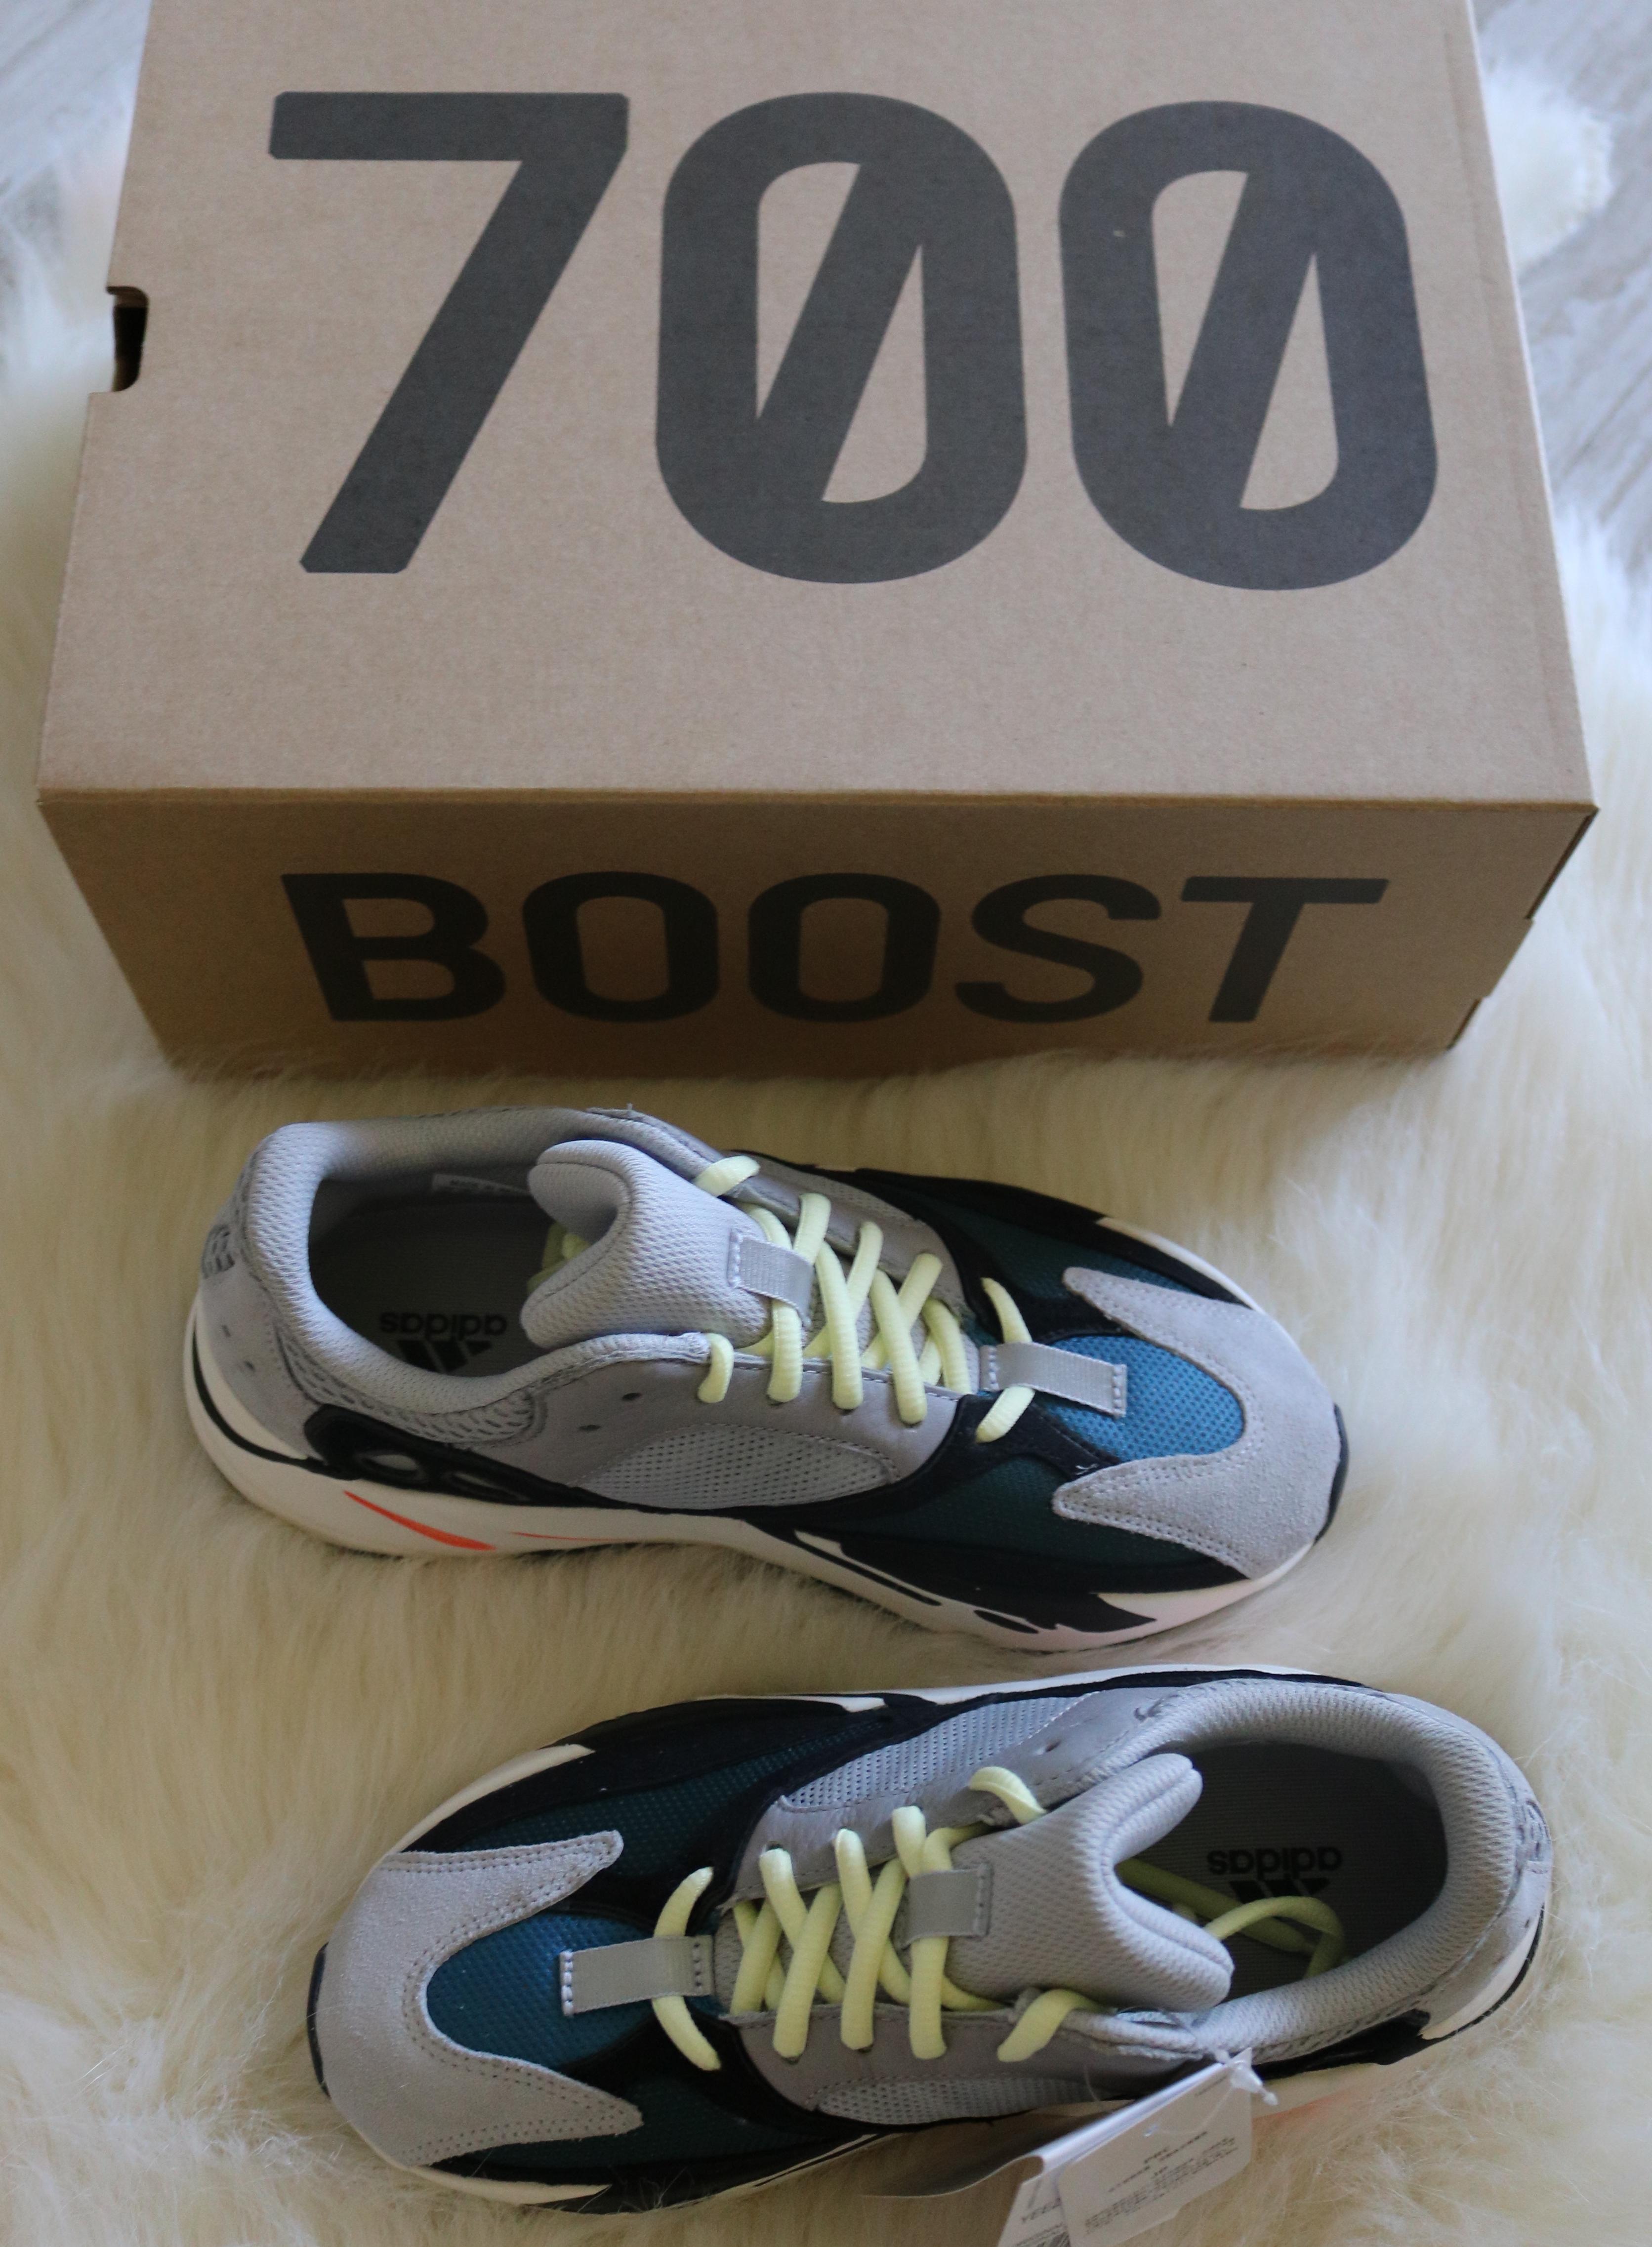 238133de2e6 Yeezy Boost adidas Yeezy Wave Runner 700 Solid Grey Size 5.5 - Low ...